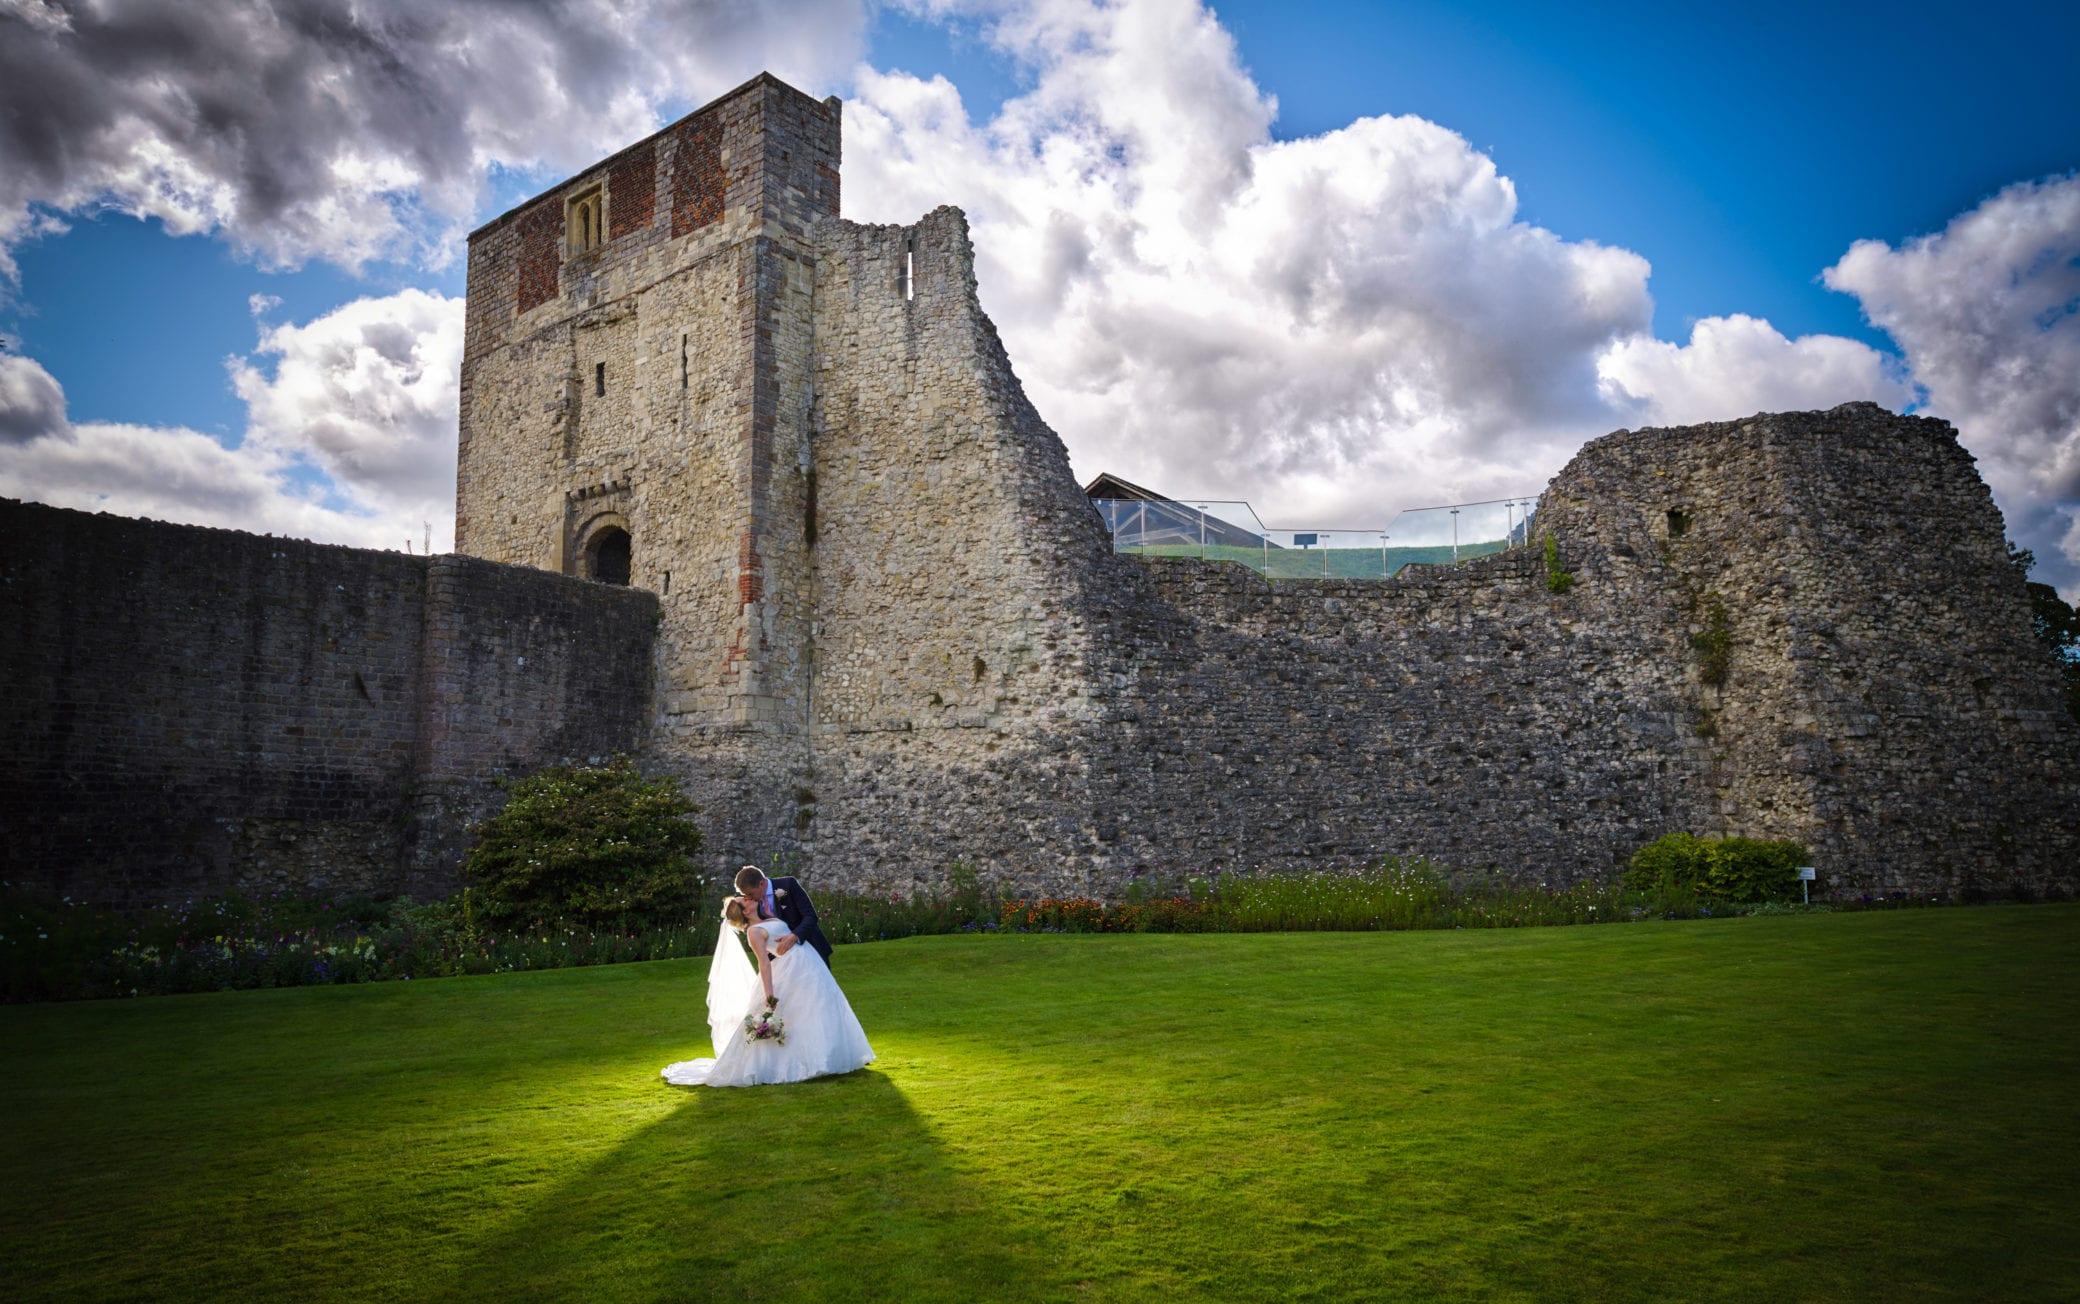 East Lawn wedding photography at Farnham Castle